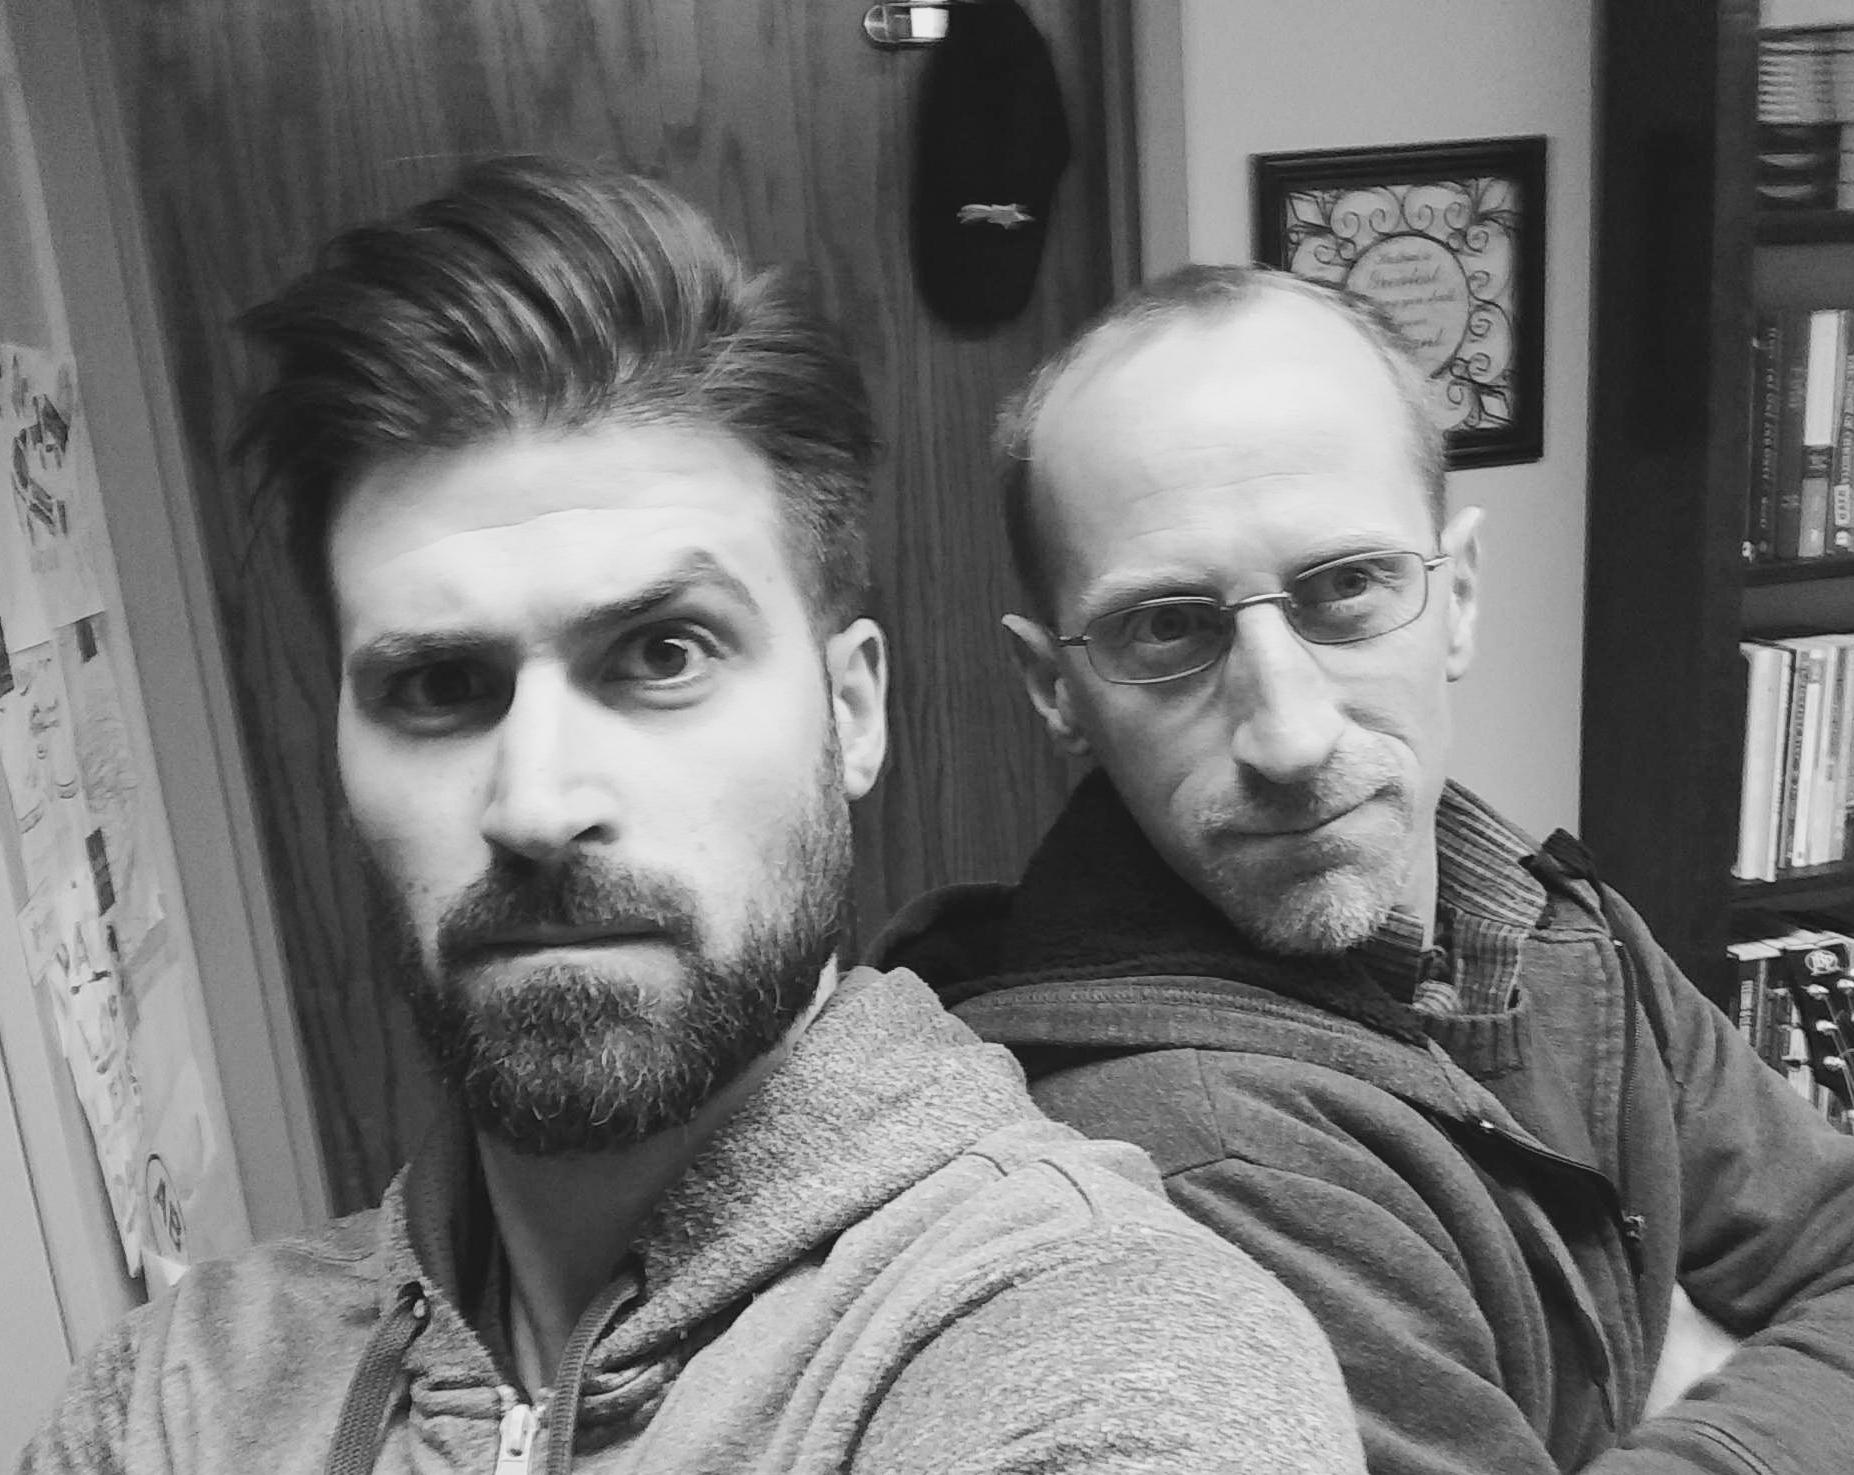 Ryan Lawrence & Kevin Burkholder